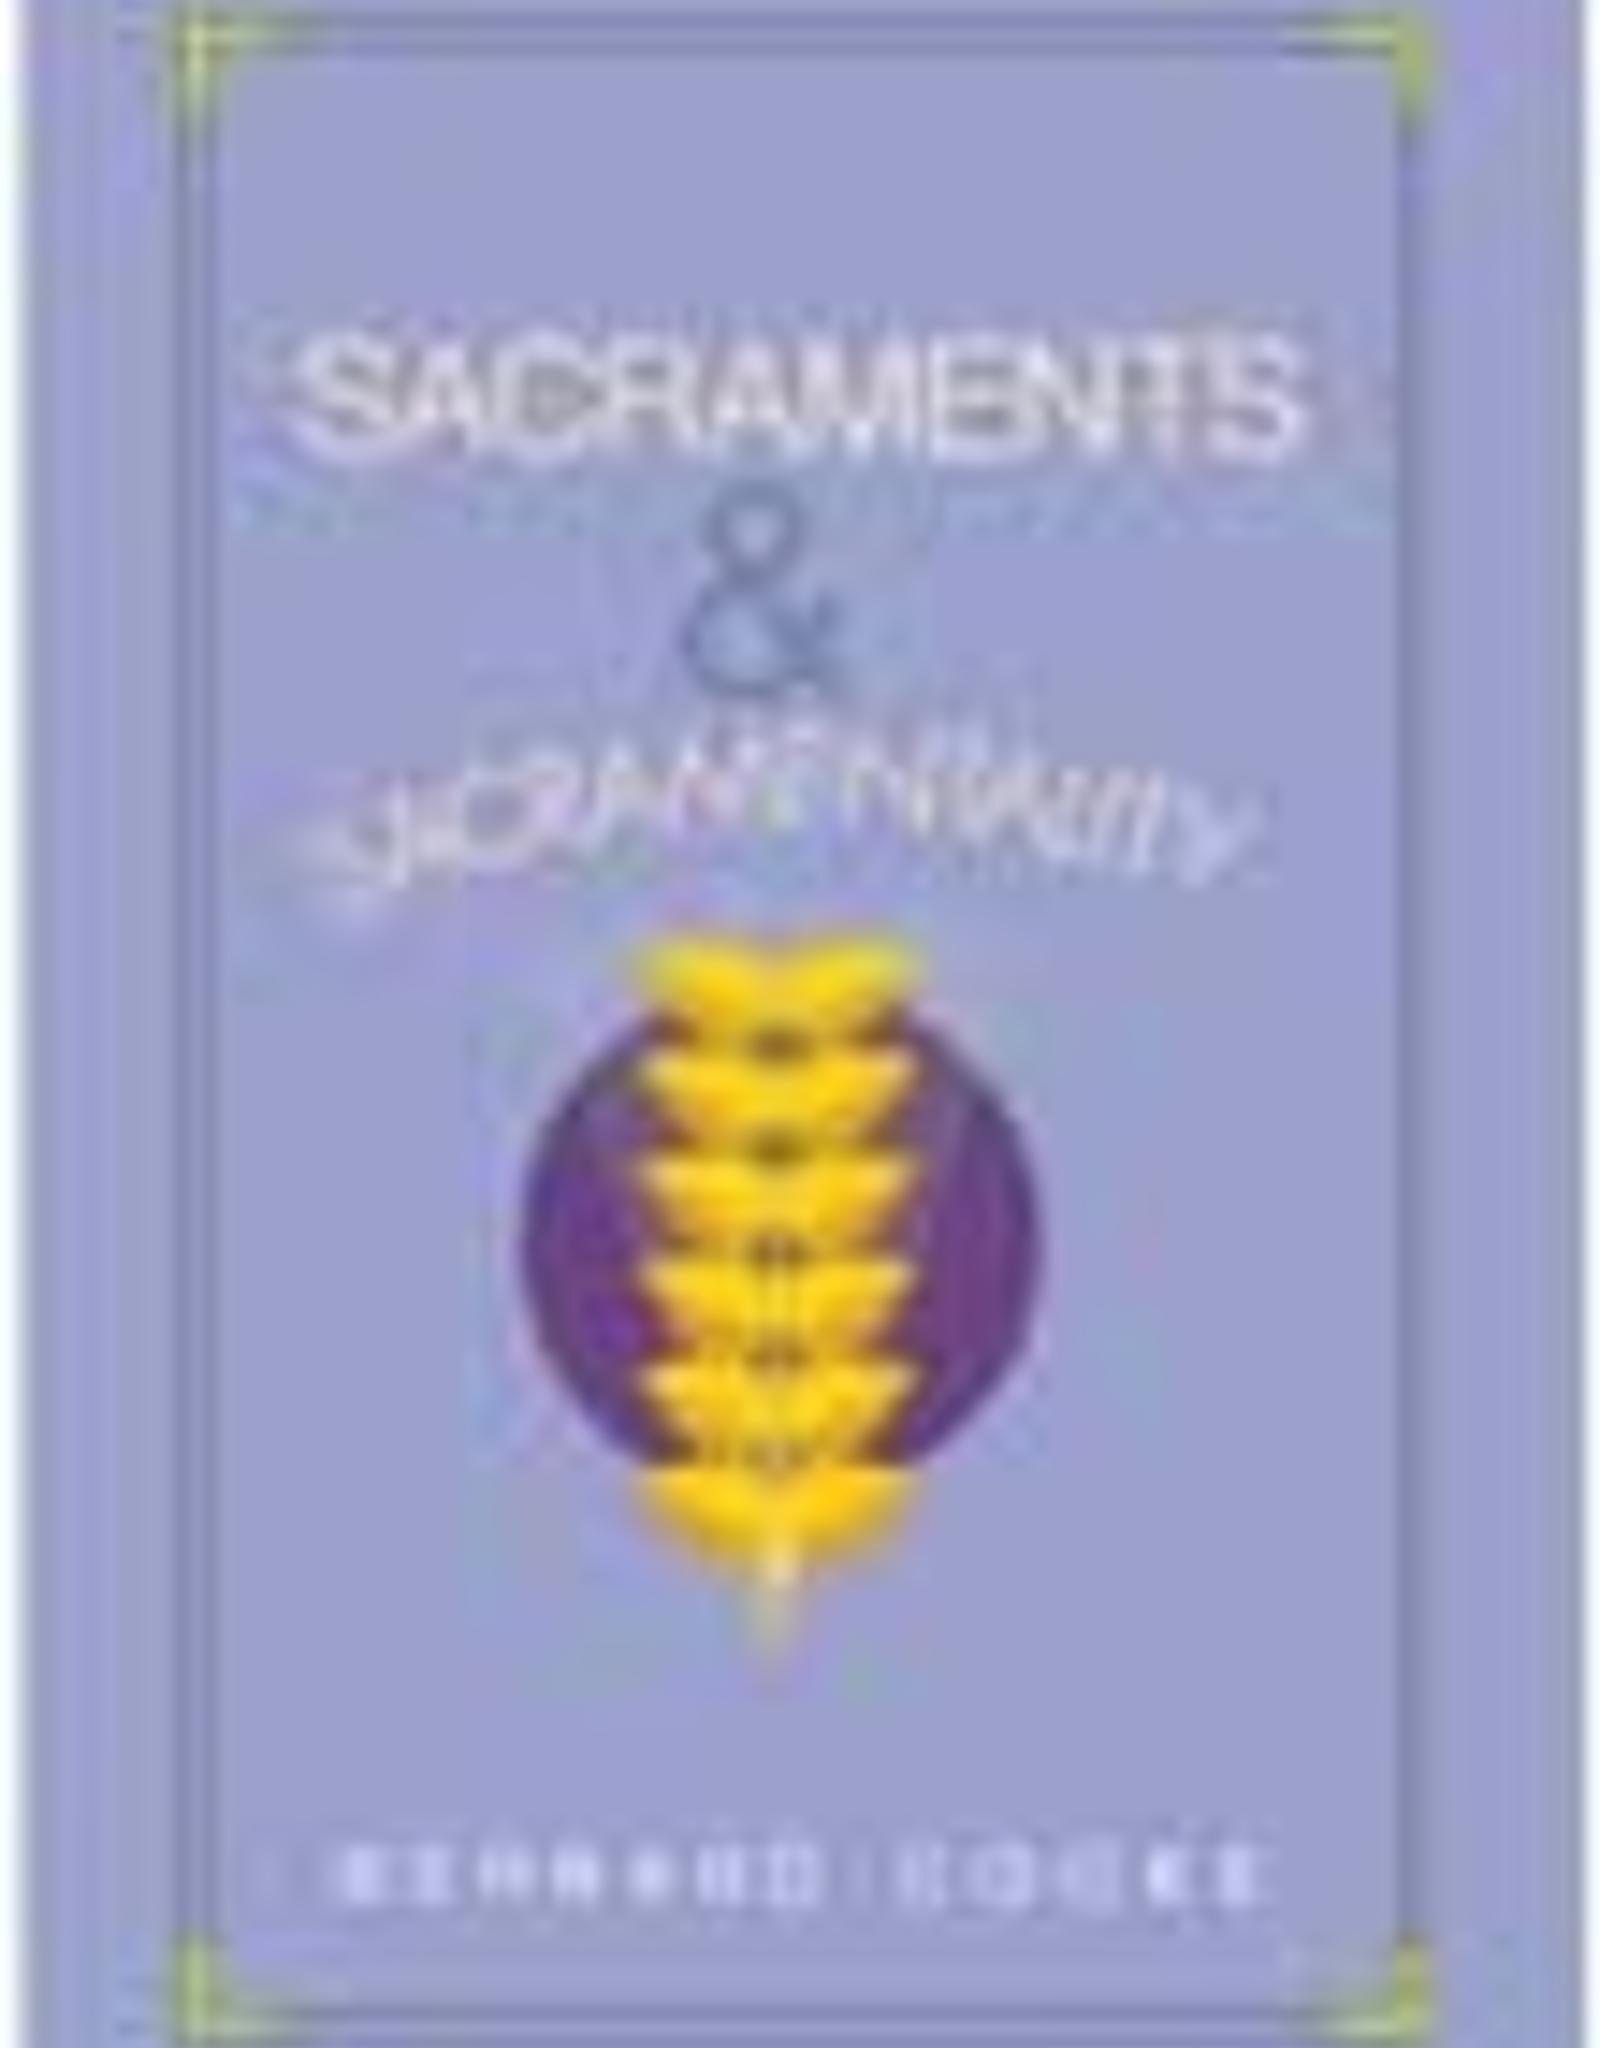 Twenty Third Publications Sacraments and Sacramentality, by Bernard Cooke (paperback)